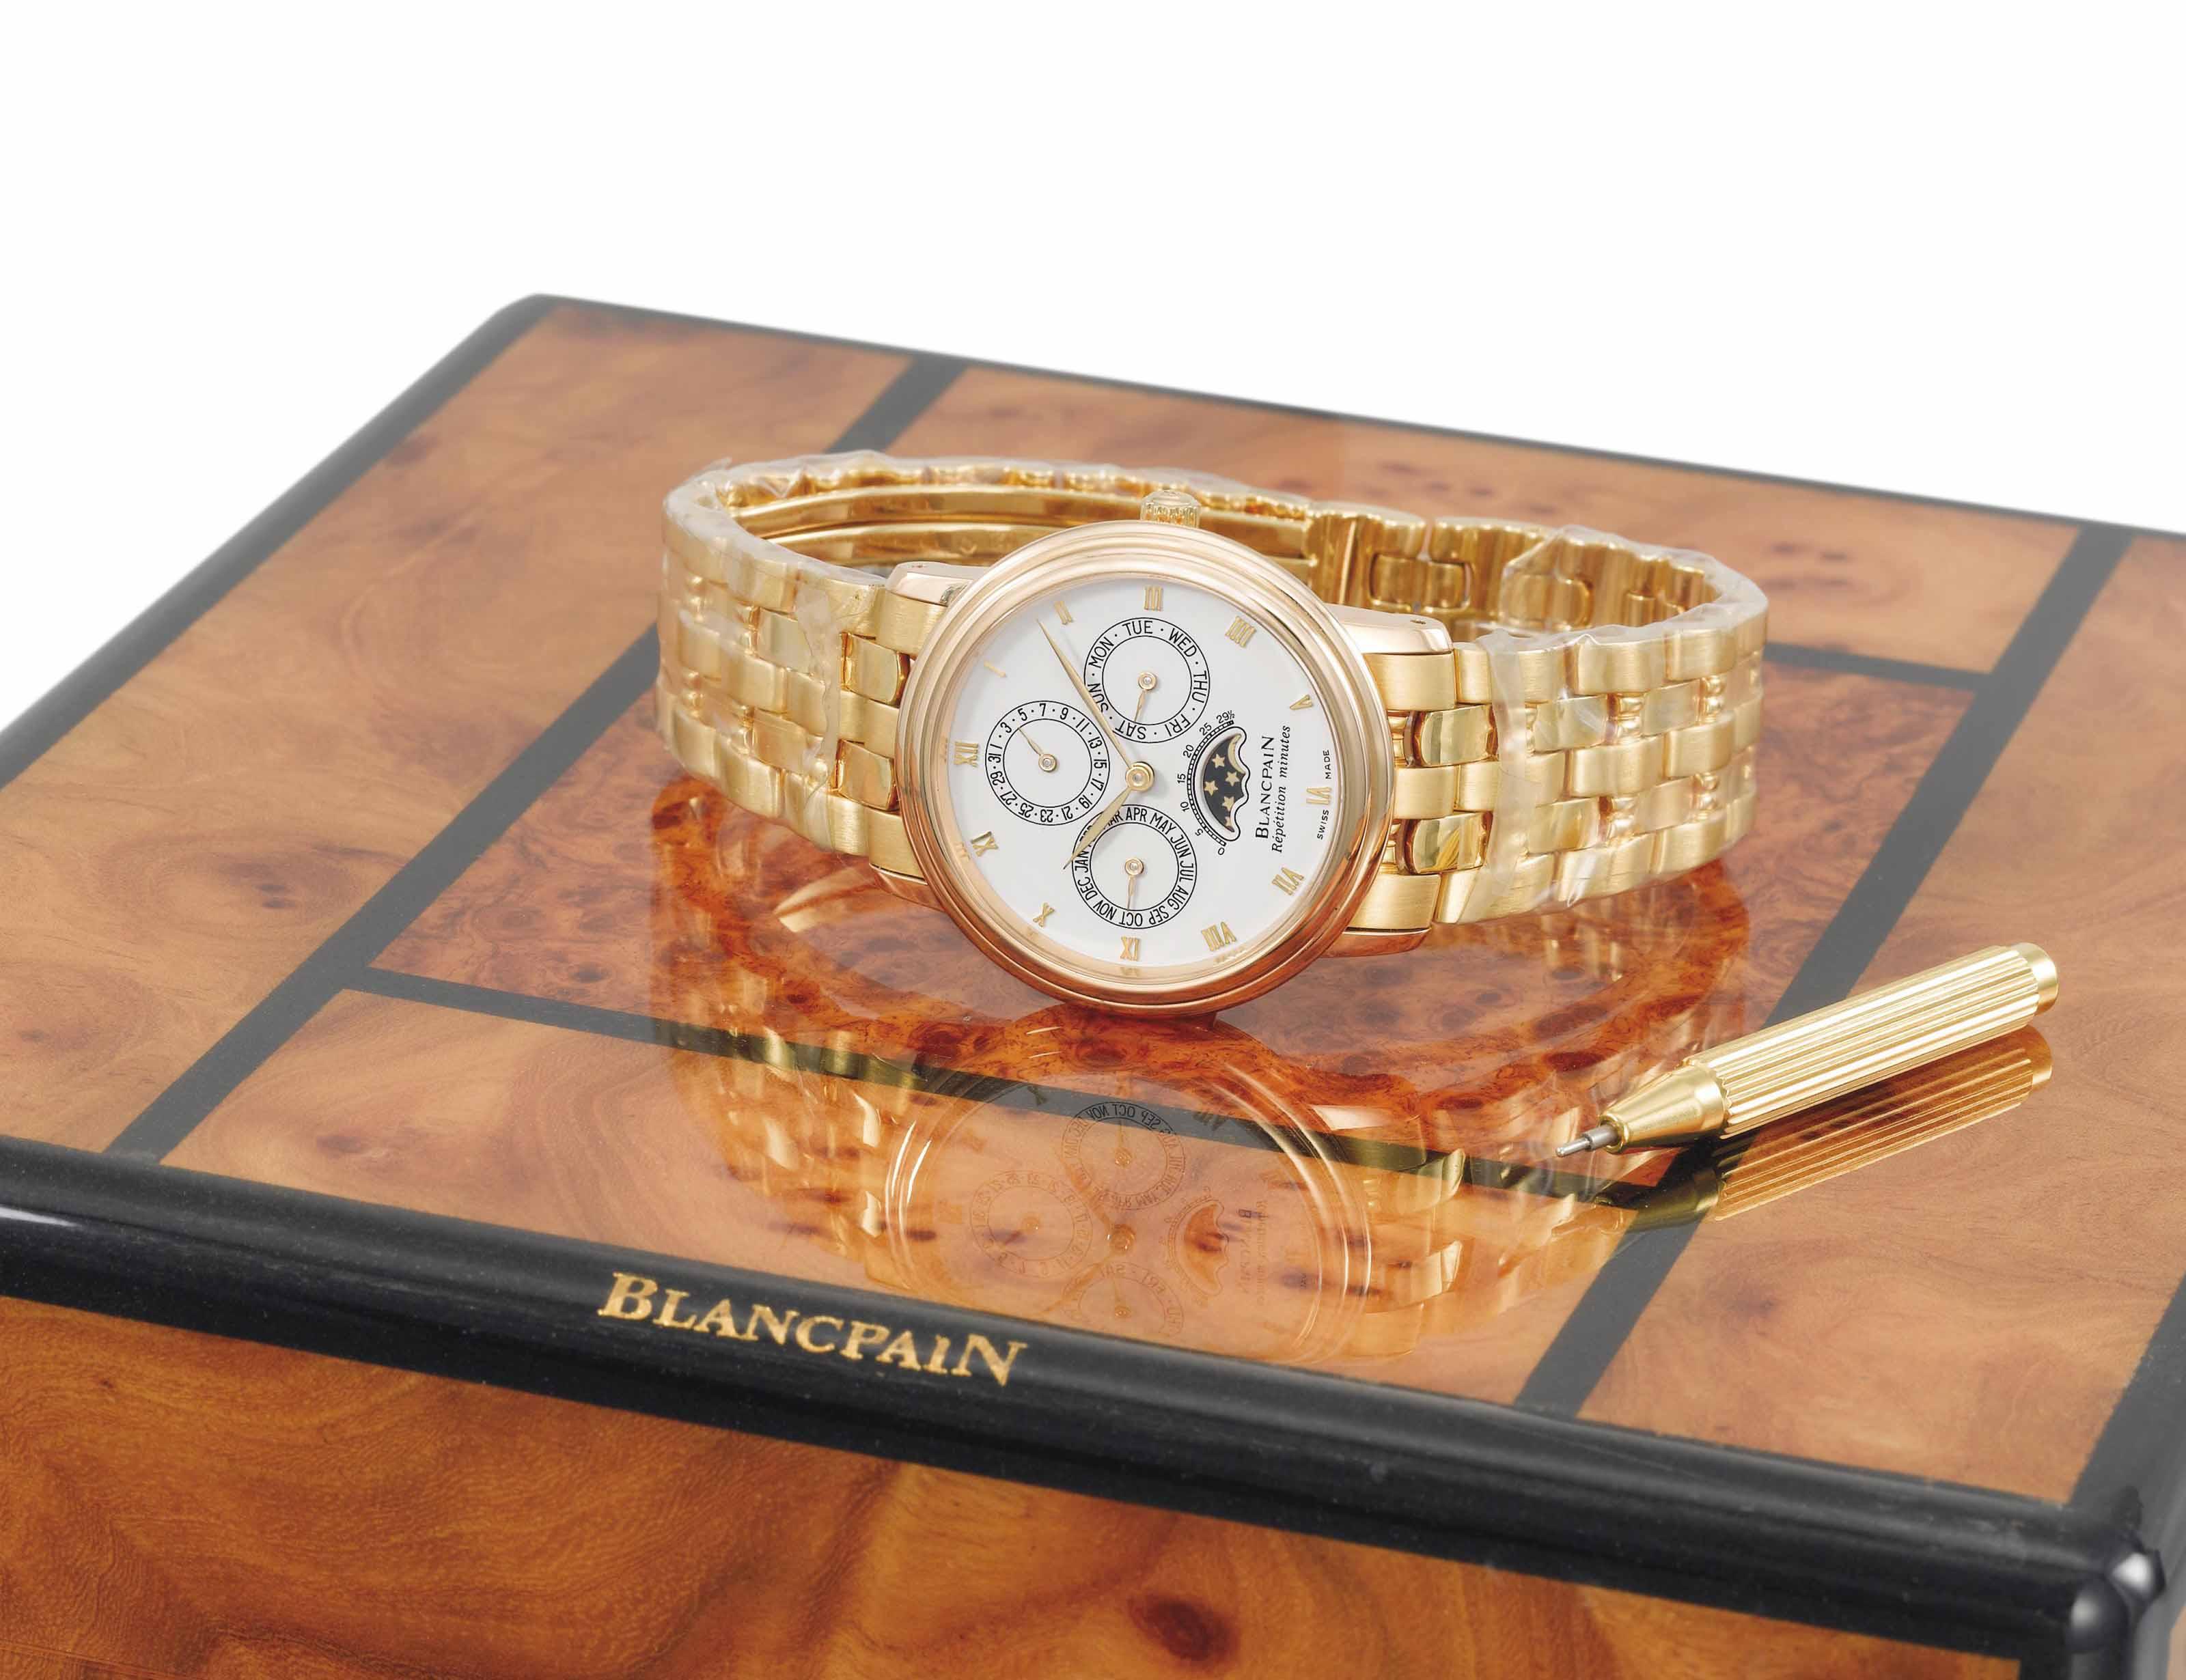 Blancpain. A fine and elegant